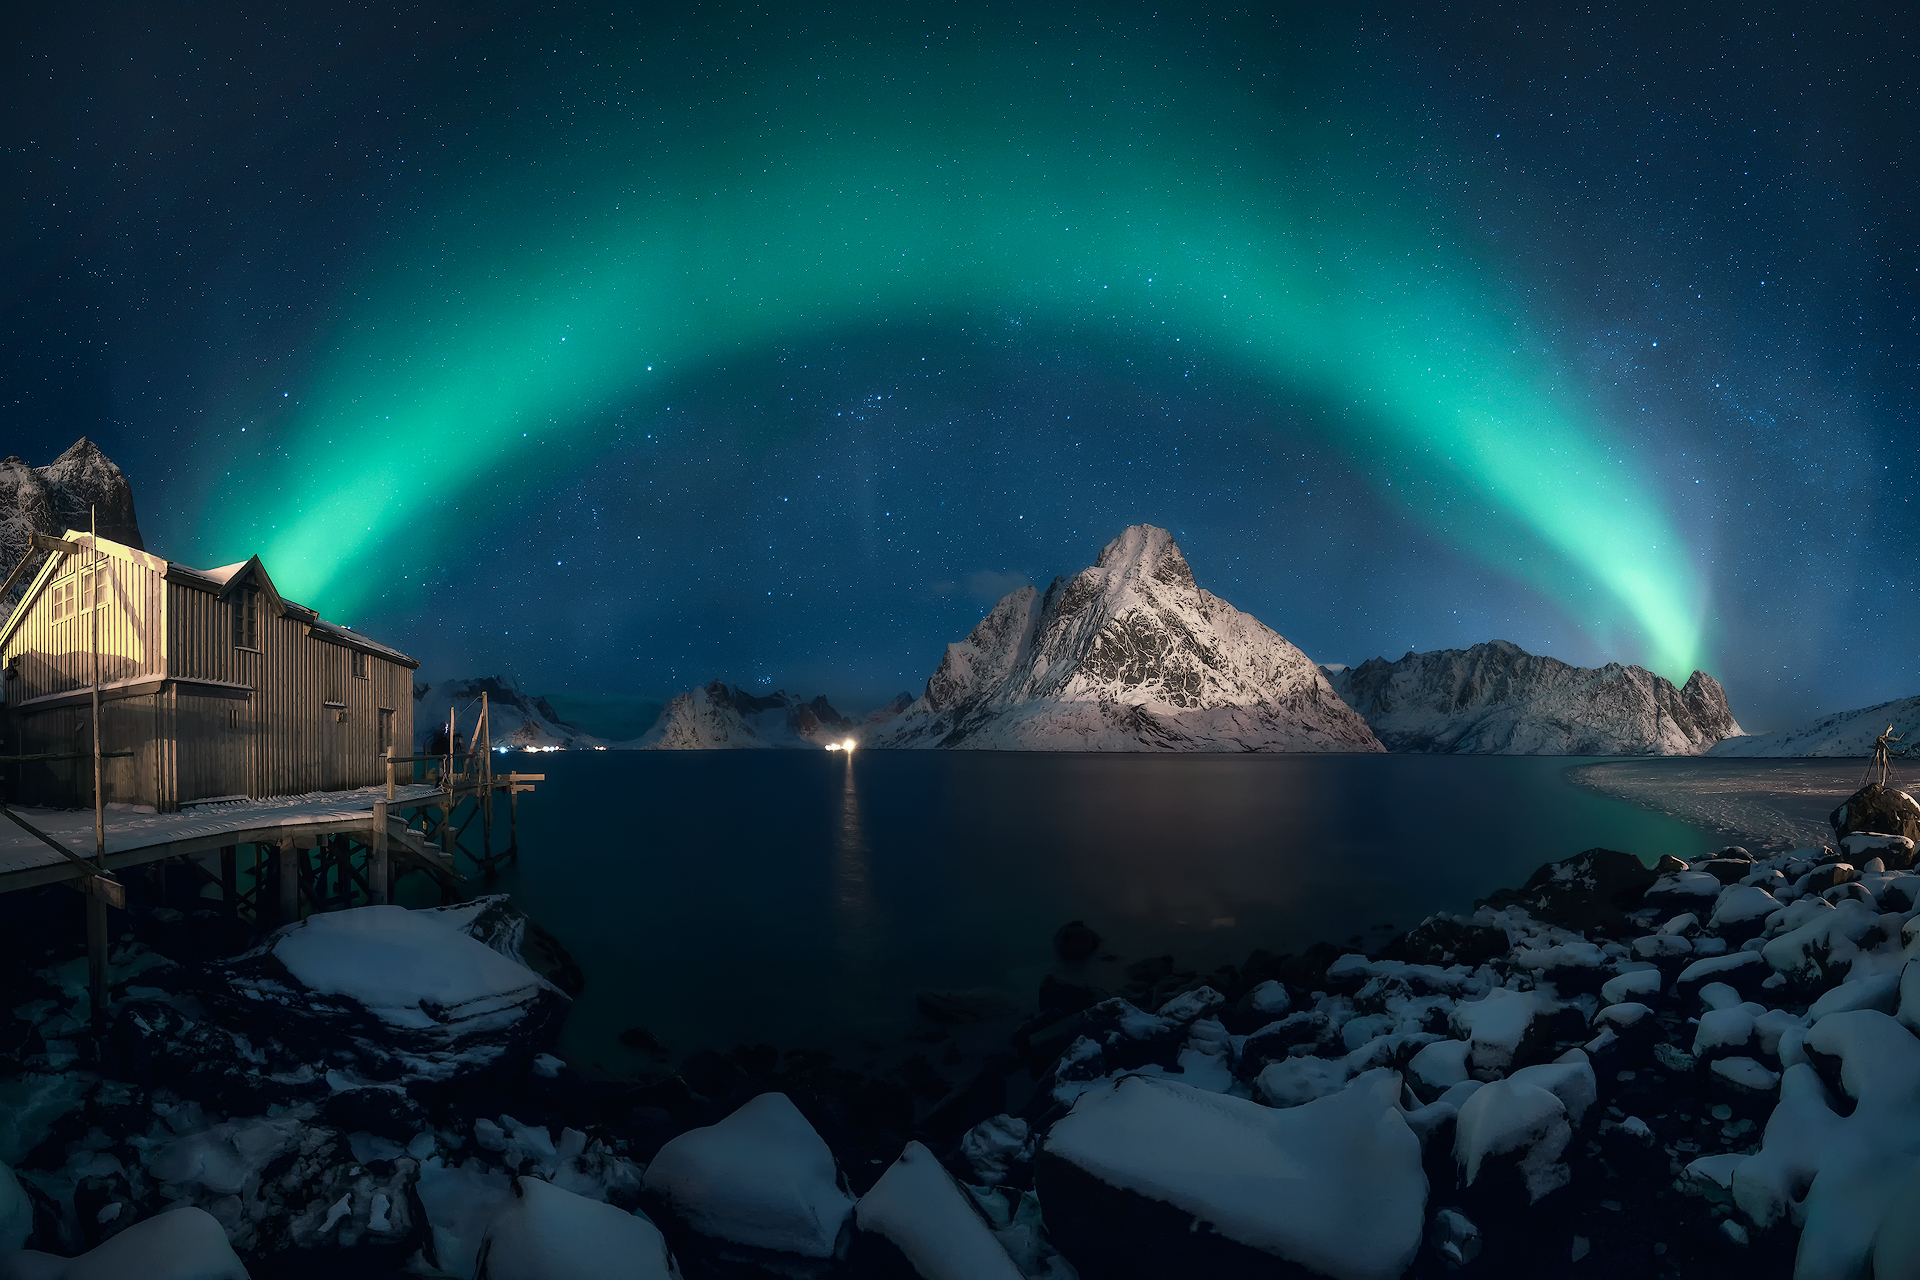 Weak northern lights panorama.